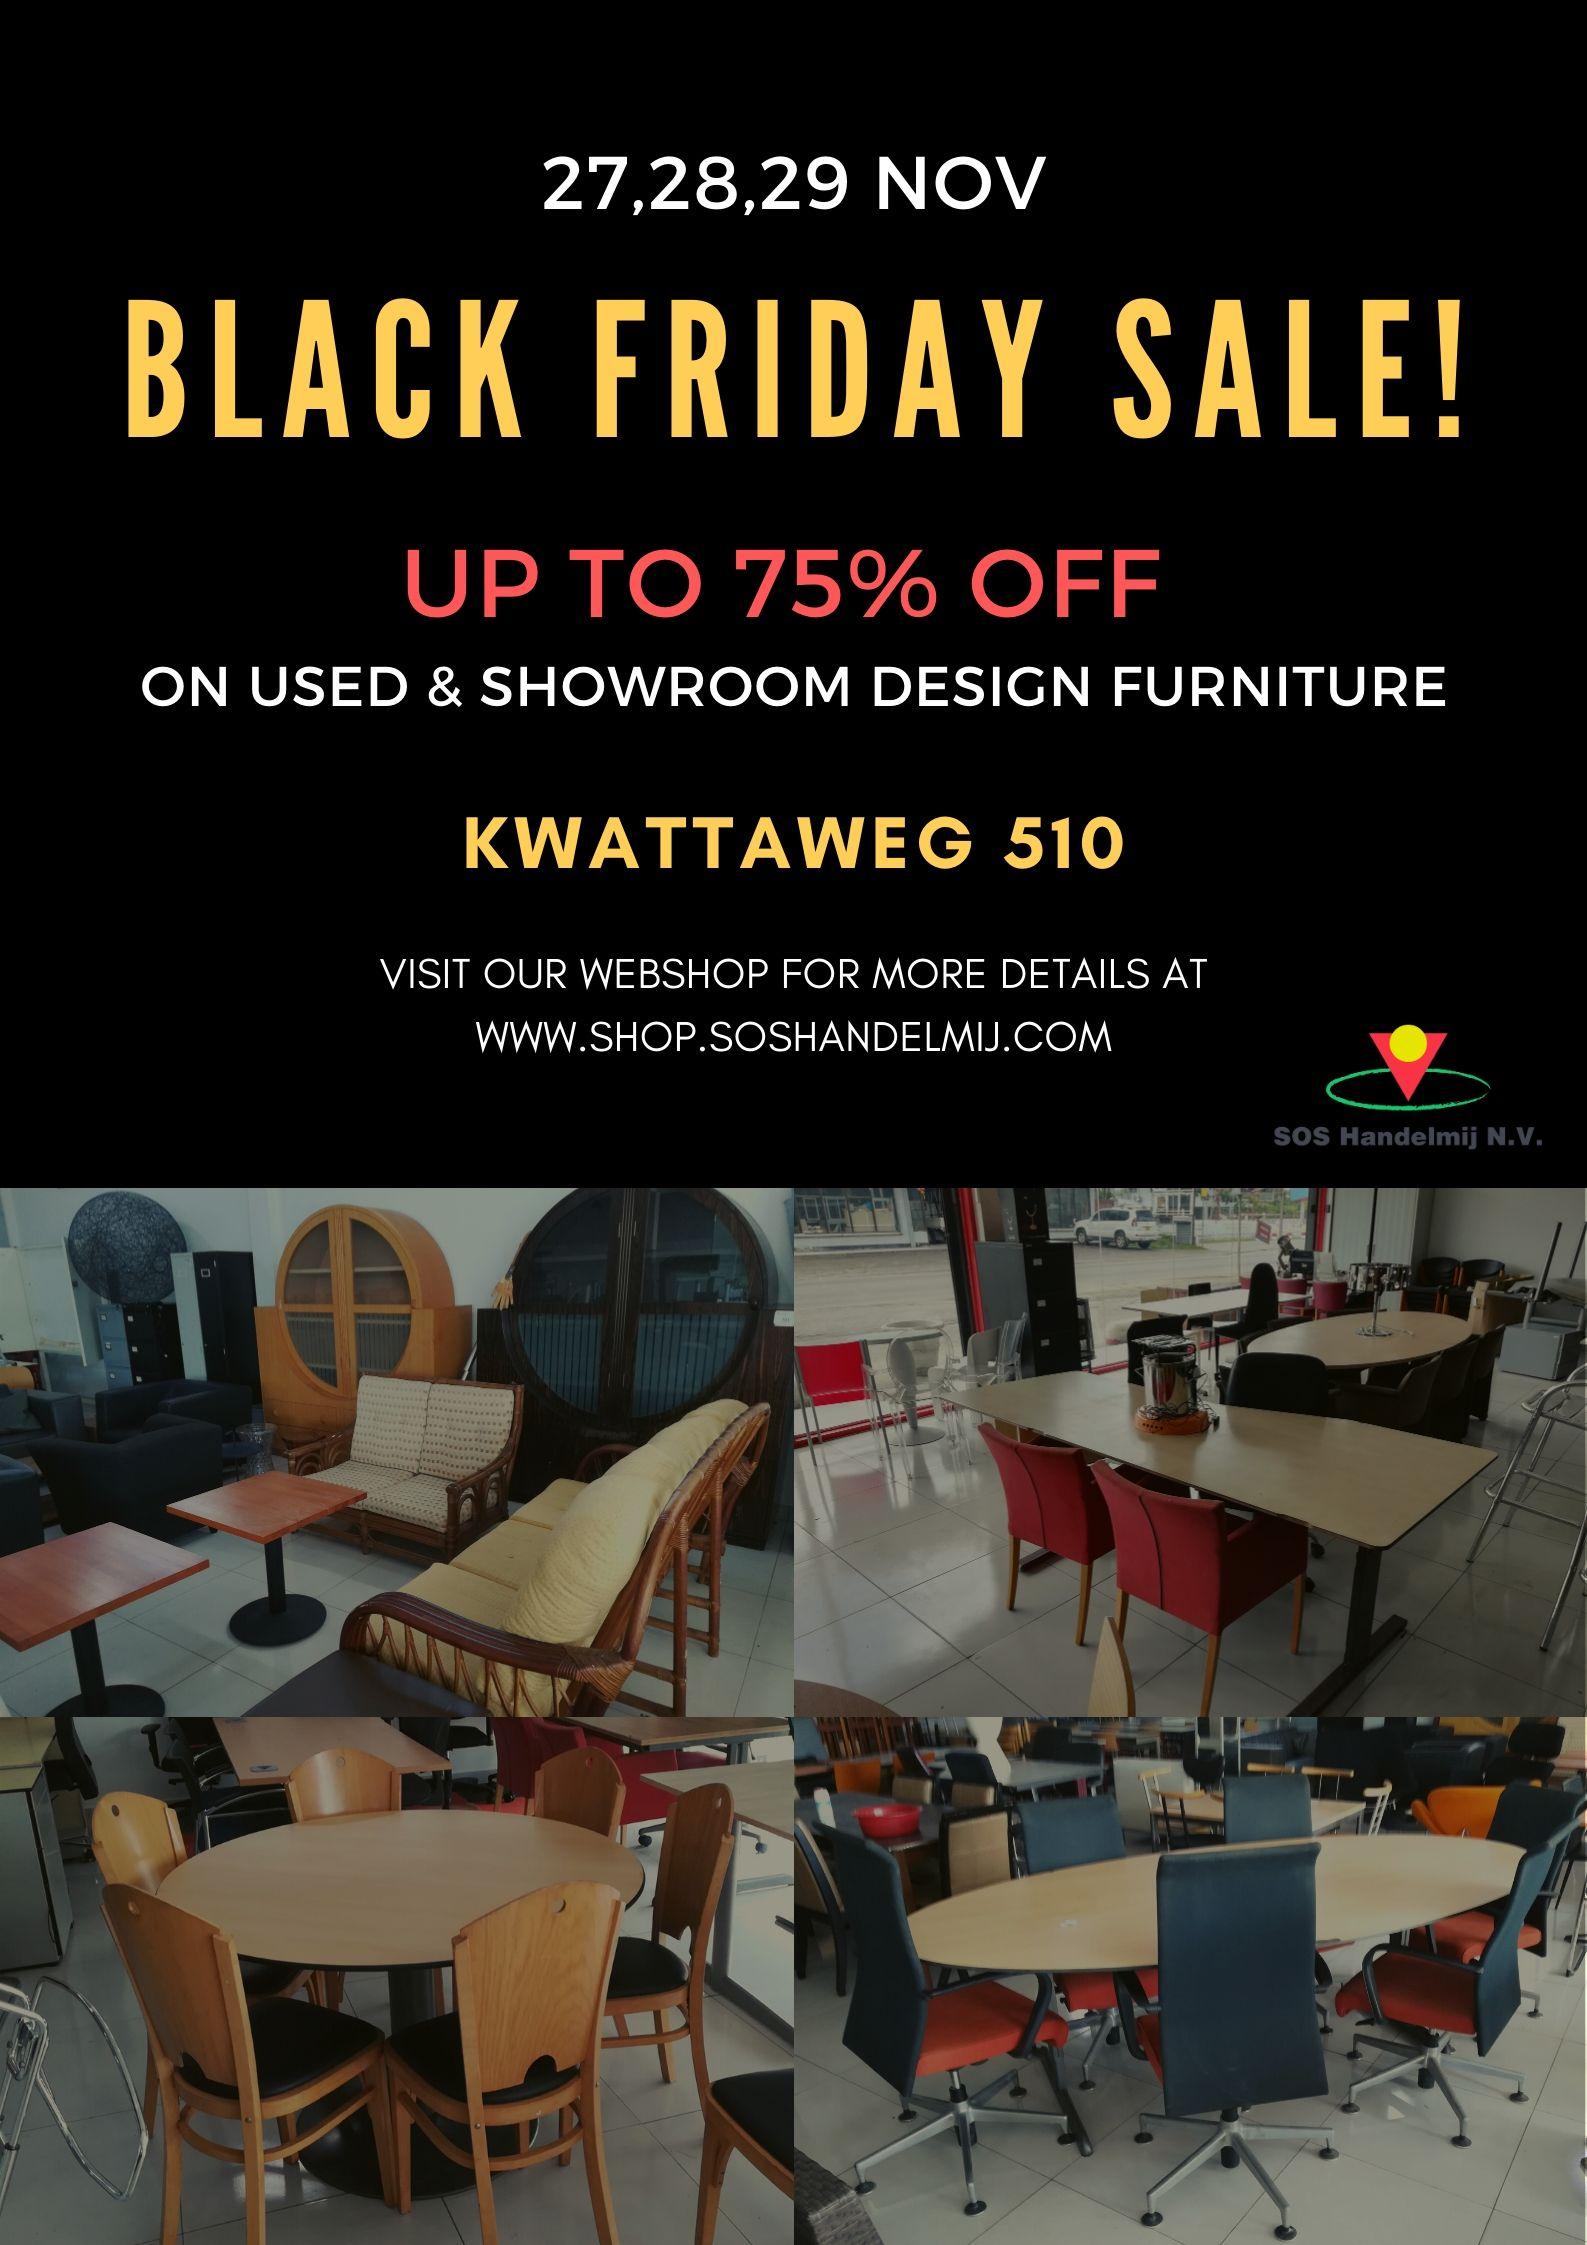 Black Friday Sale grote kortingen op meubilair